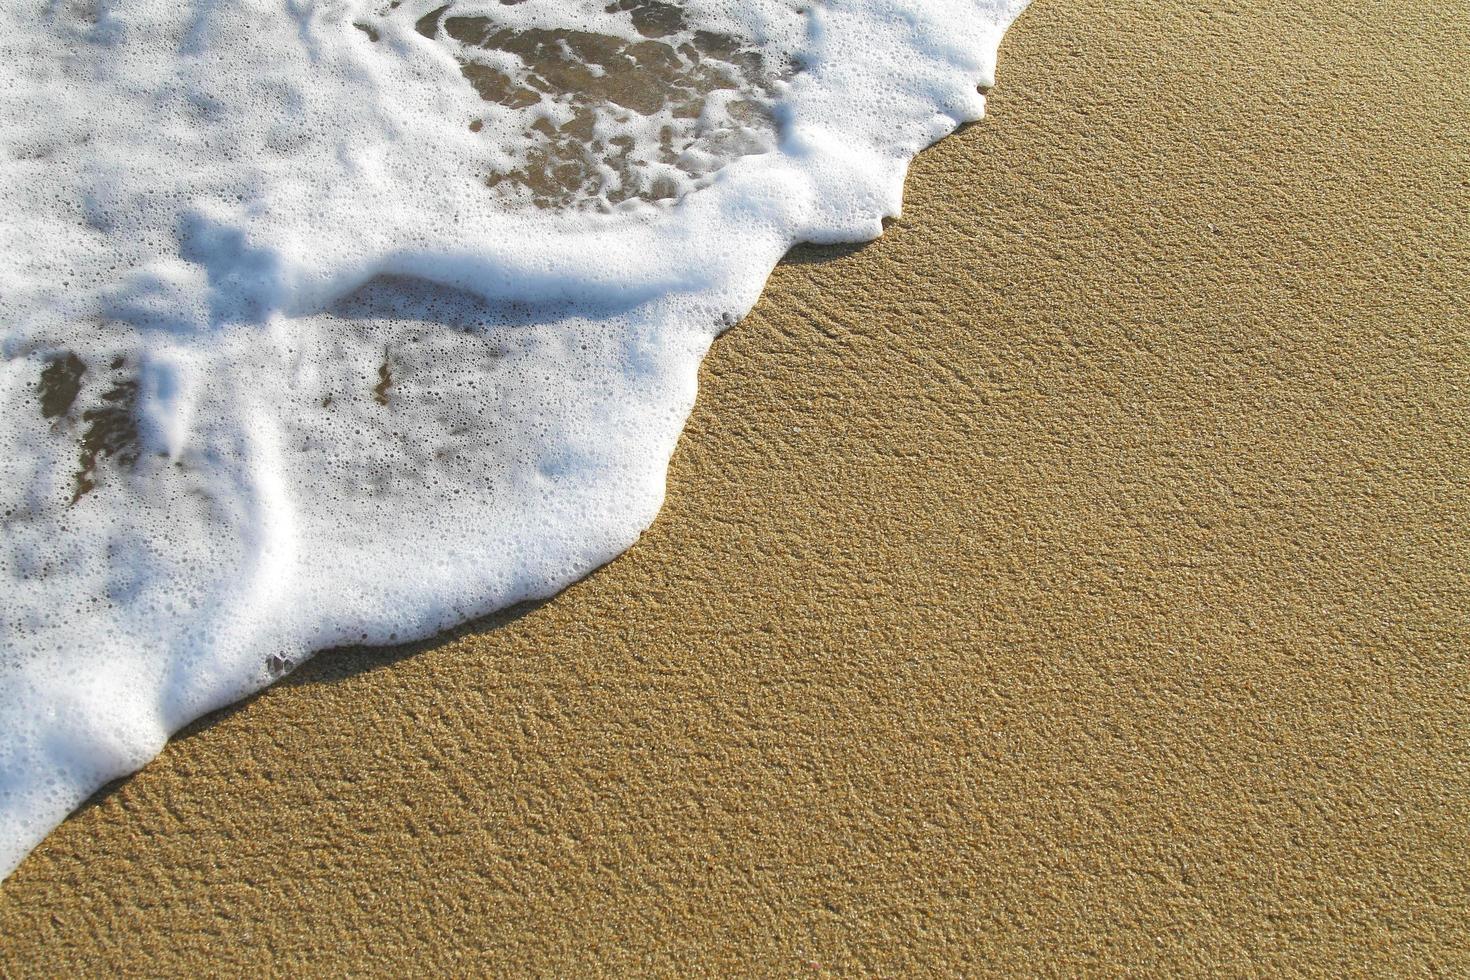 Seashore foam on beach in the sun photo